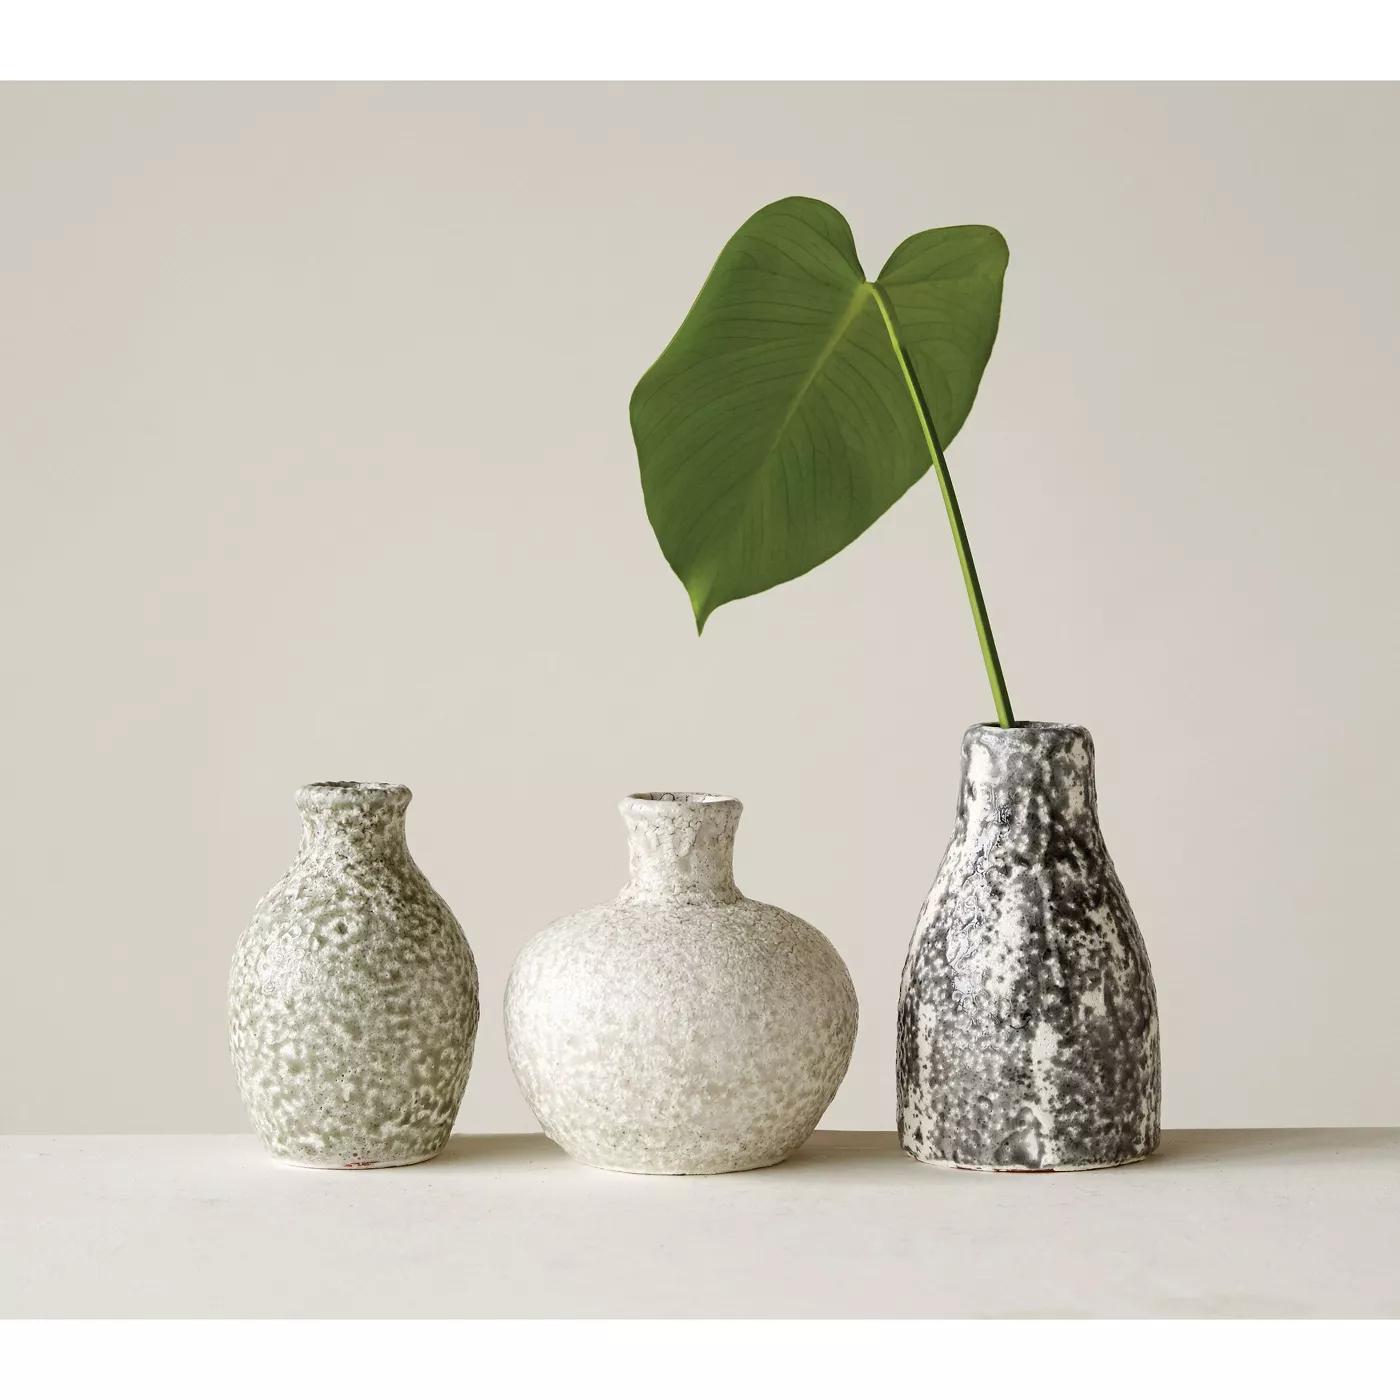 Distressed Terracotta Vases, Gray, Set of 3